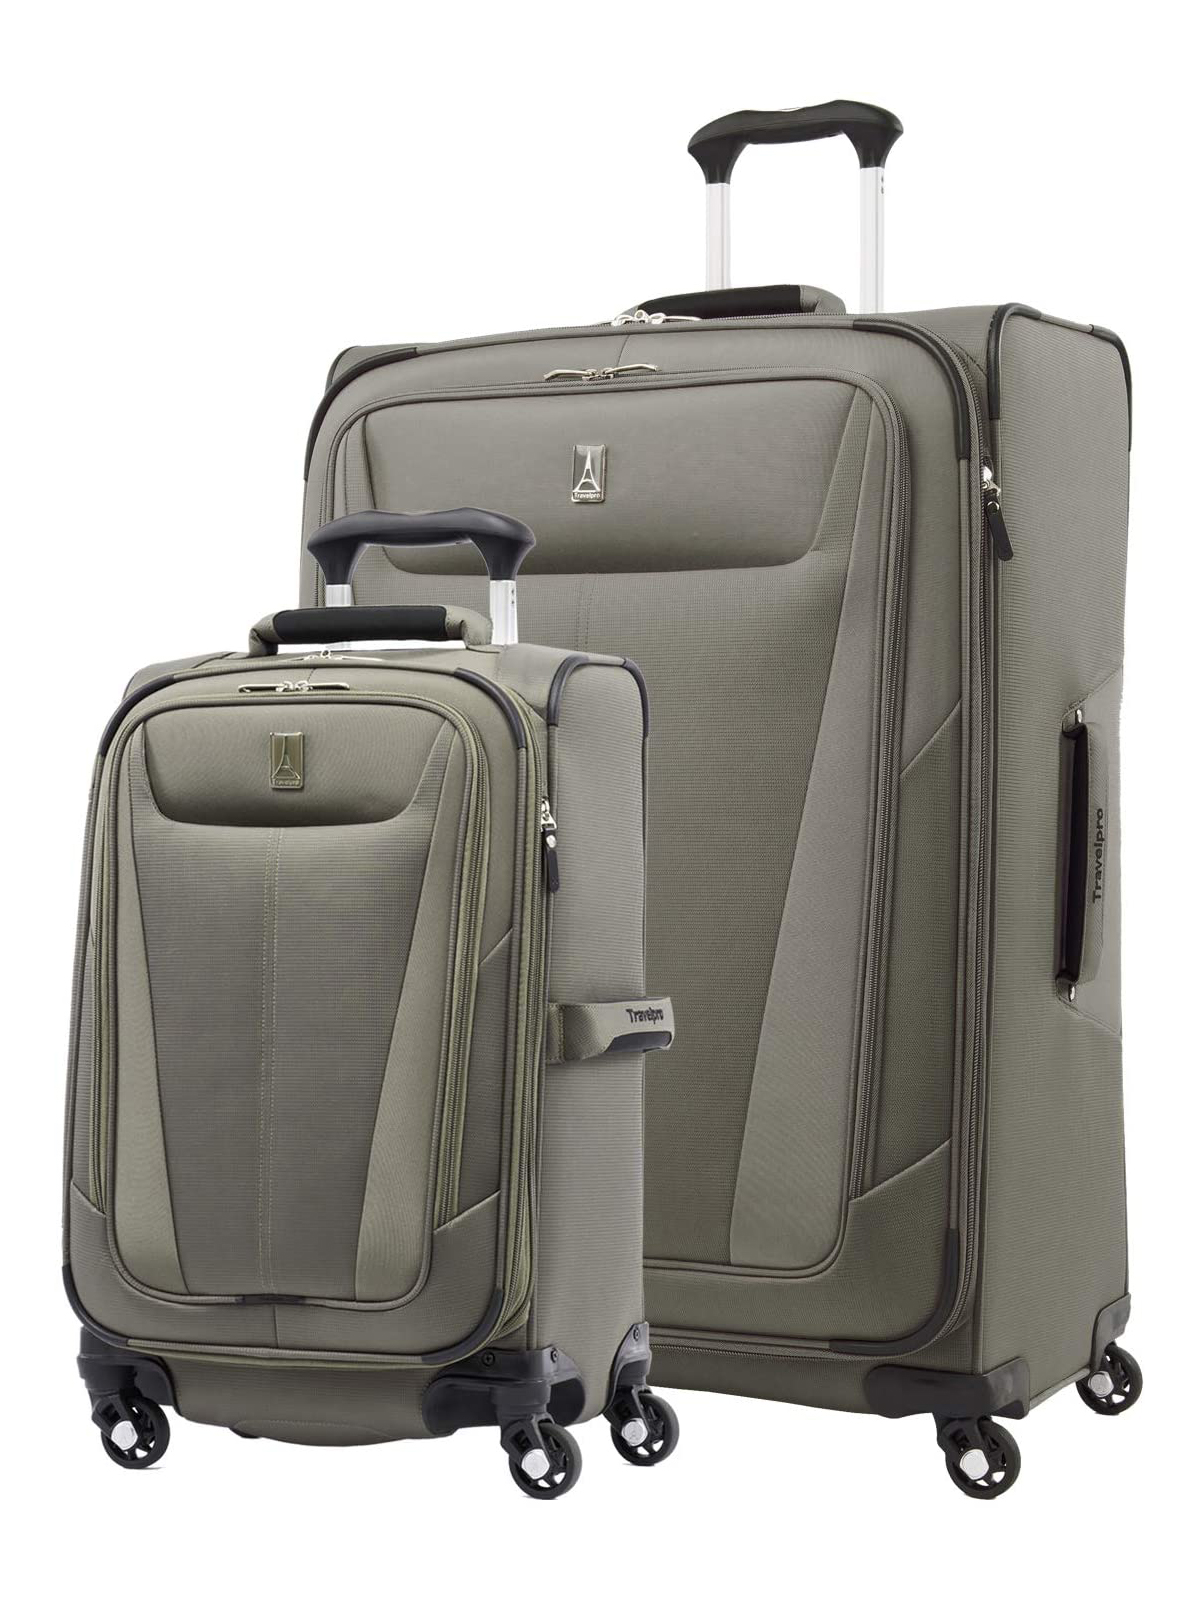 Travelpro Maxlite 5 Set